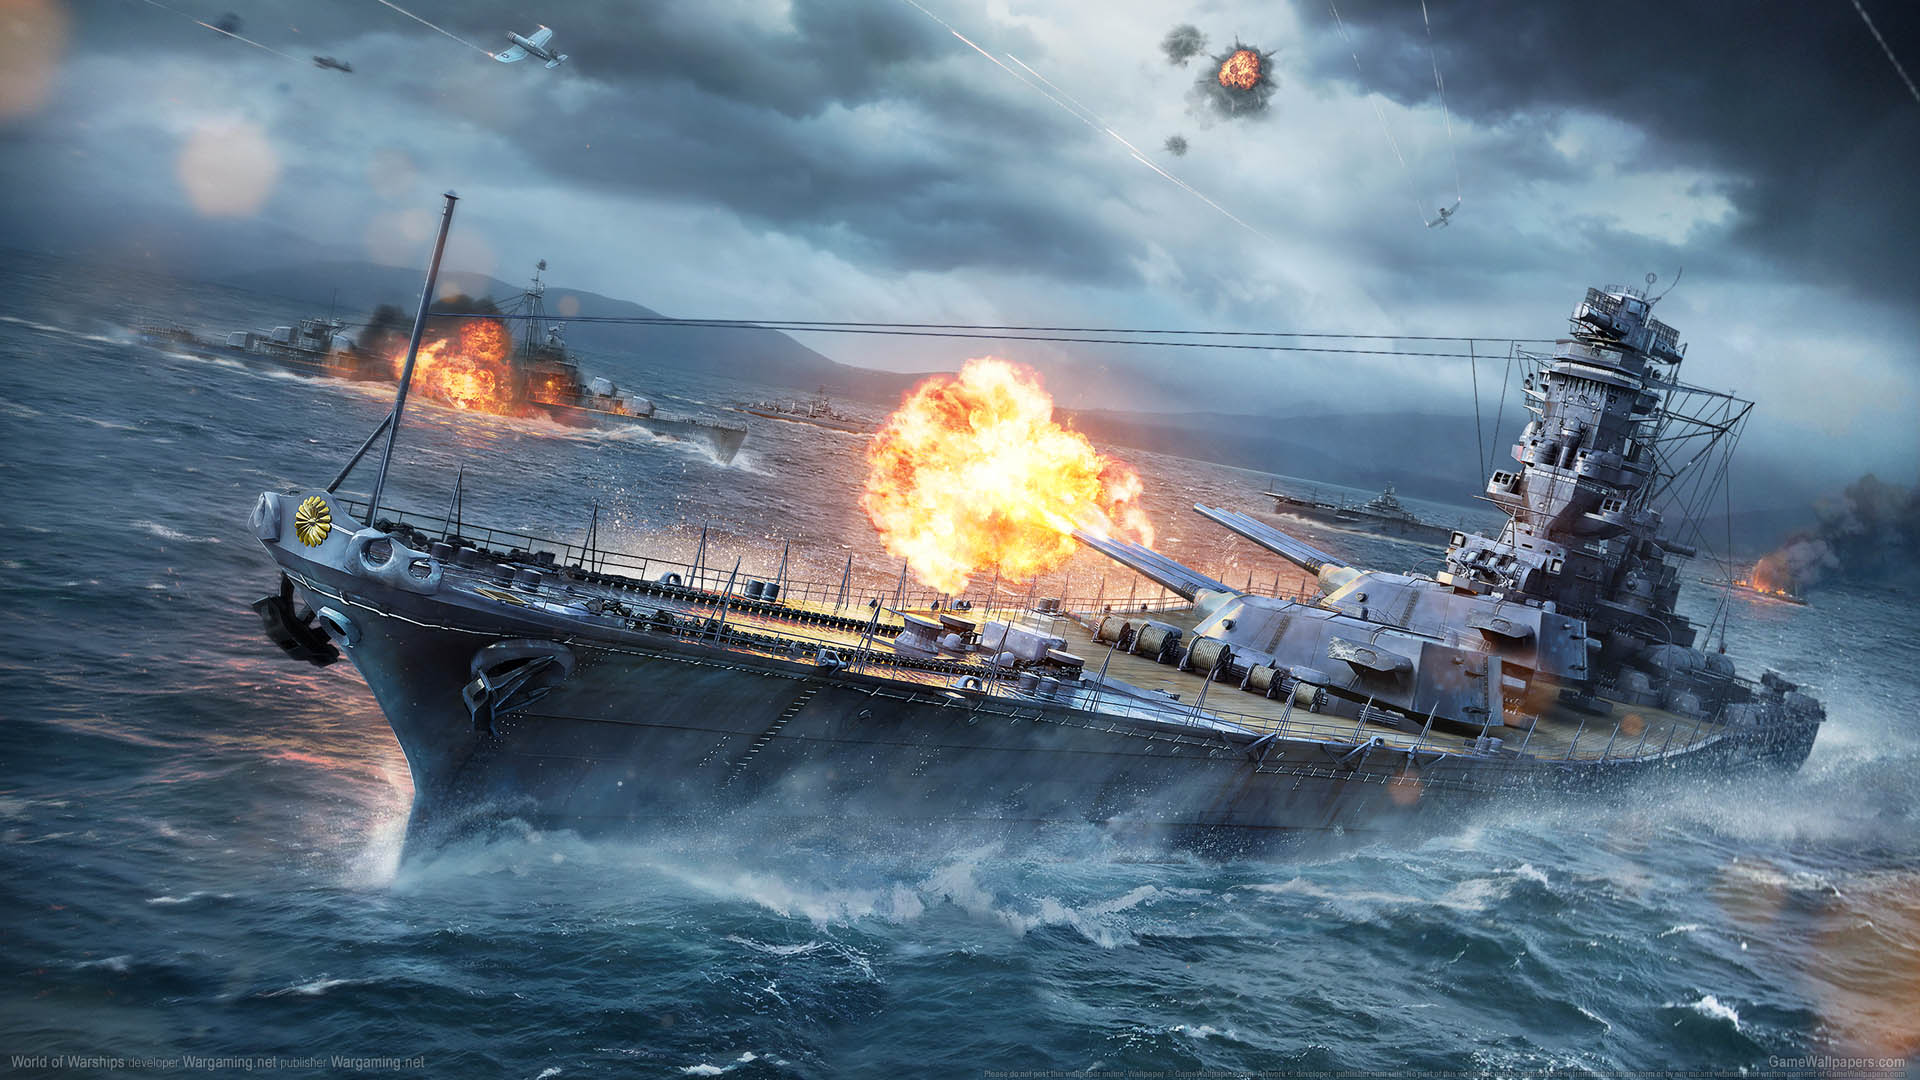 World of Warships wallpaper 04 1920x1080